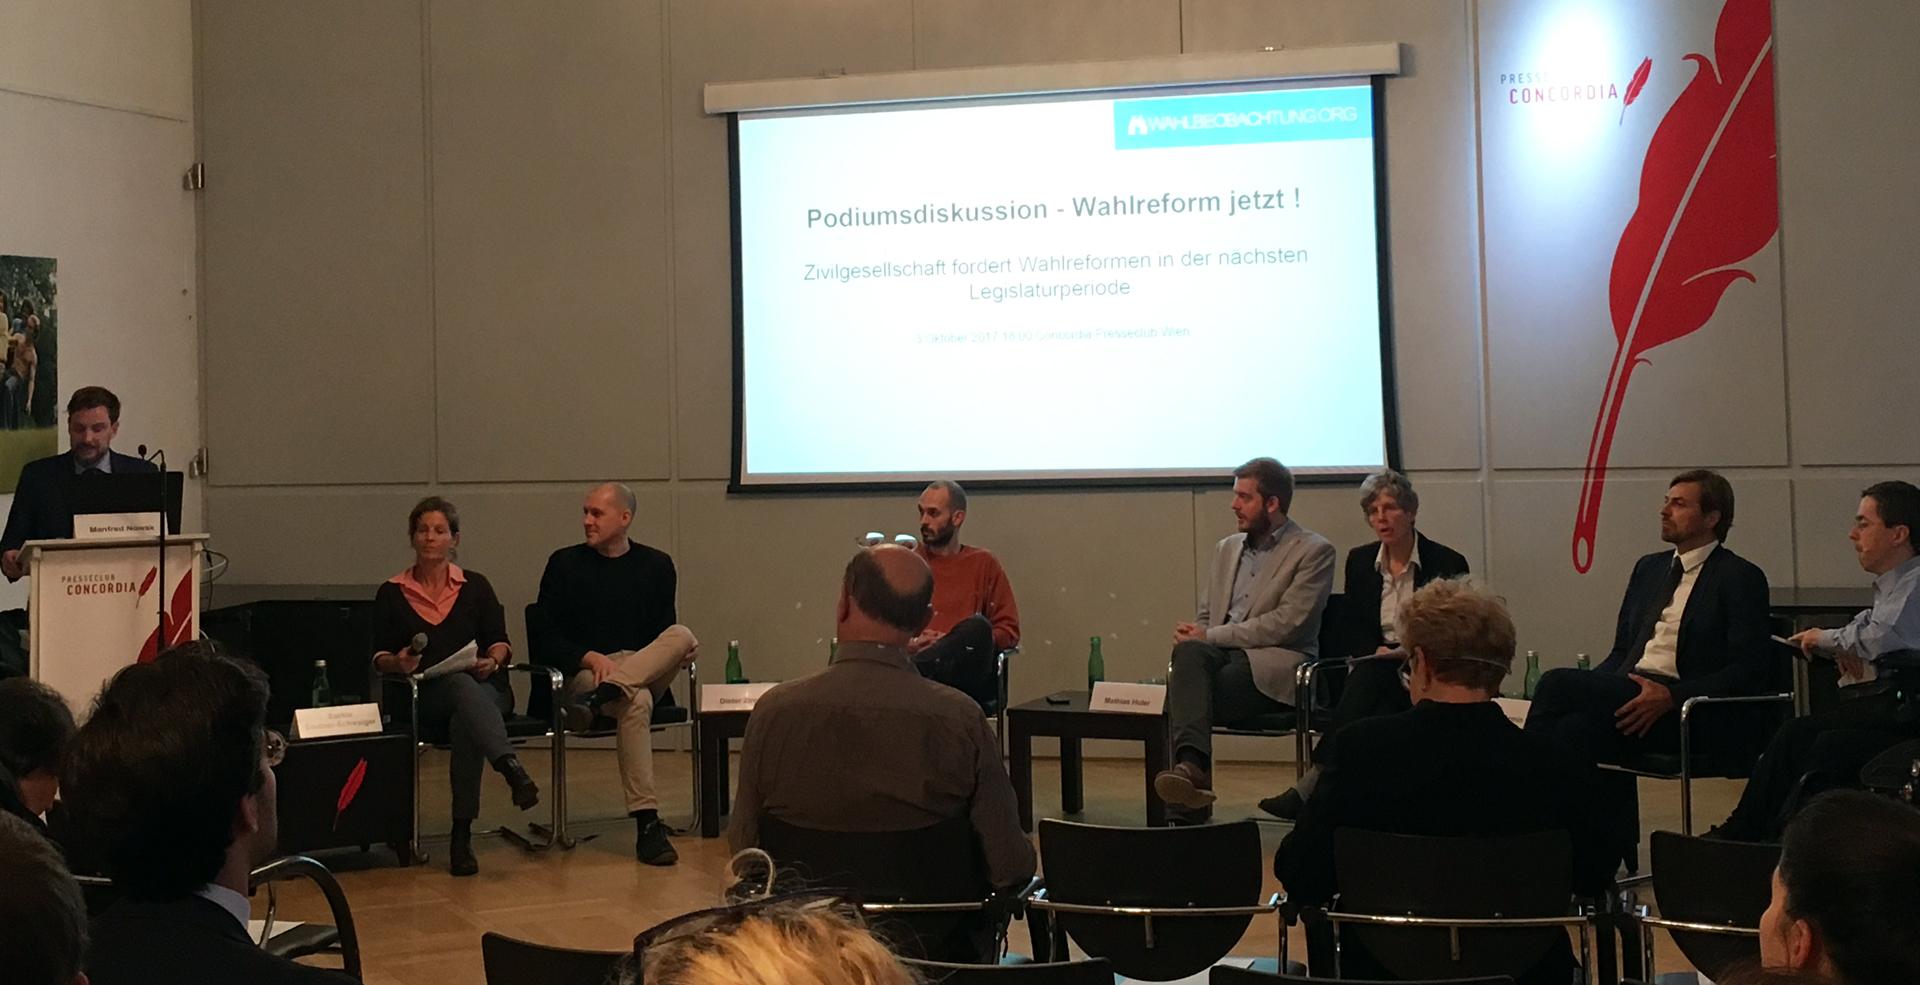 Veranstaltung im Presseklub Concordia am 3. Oktober 2017